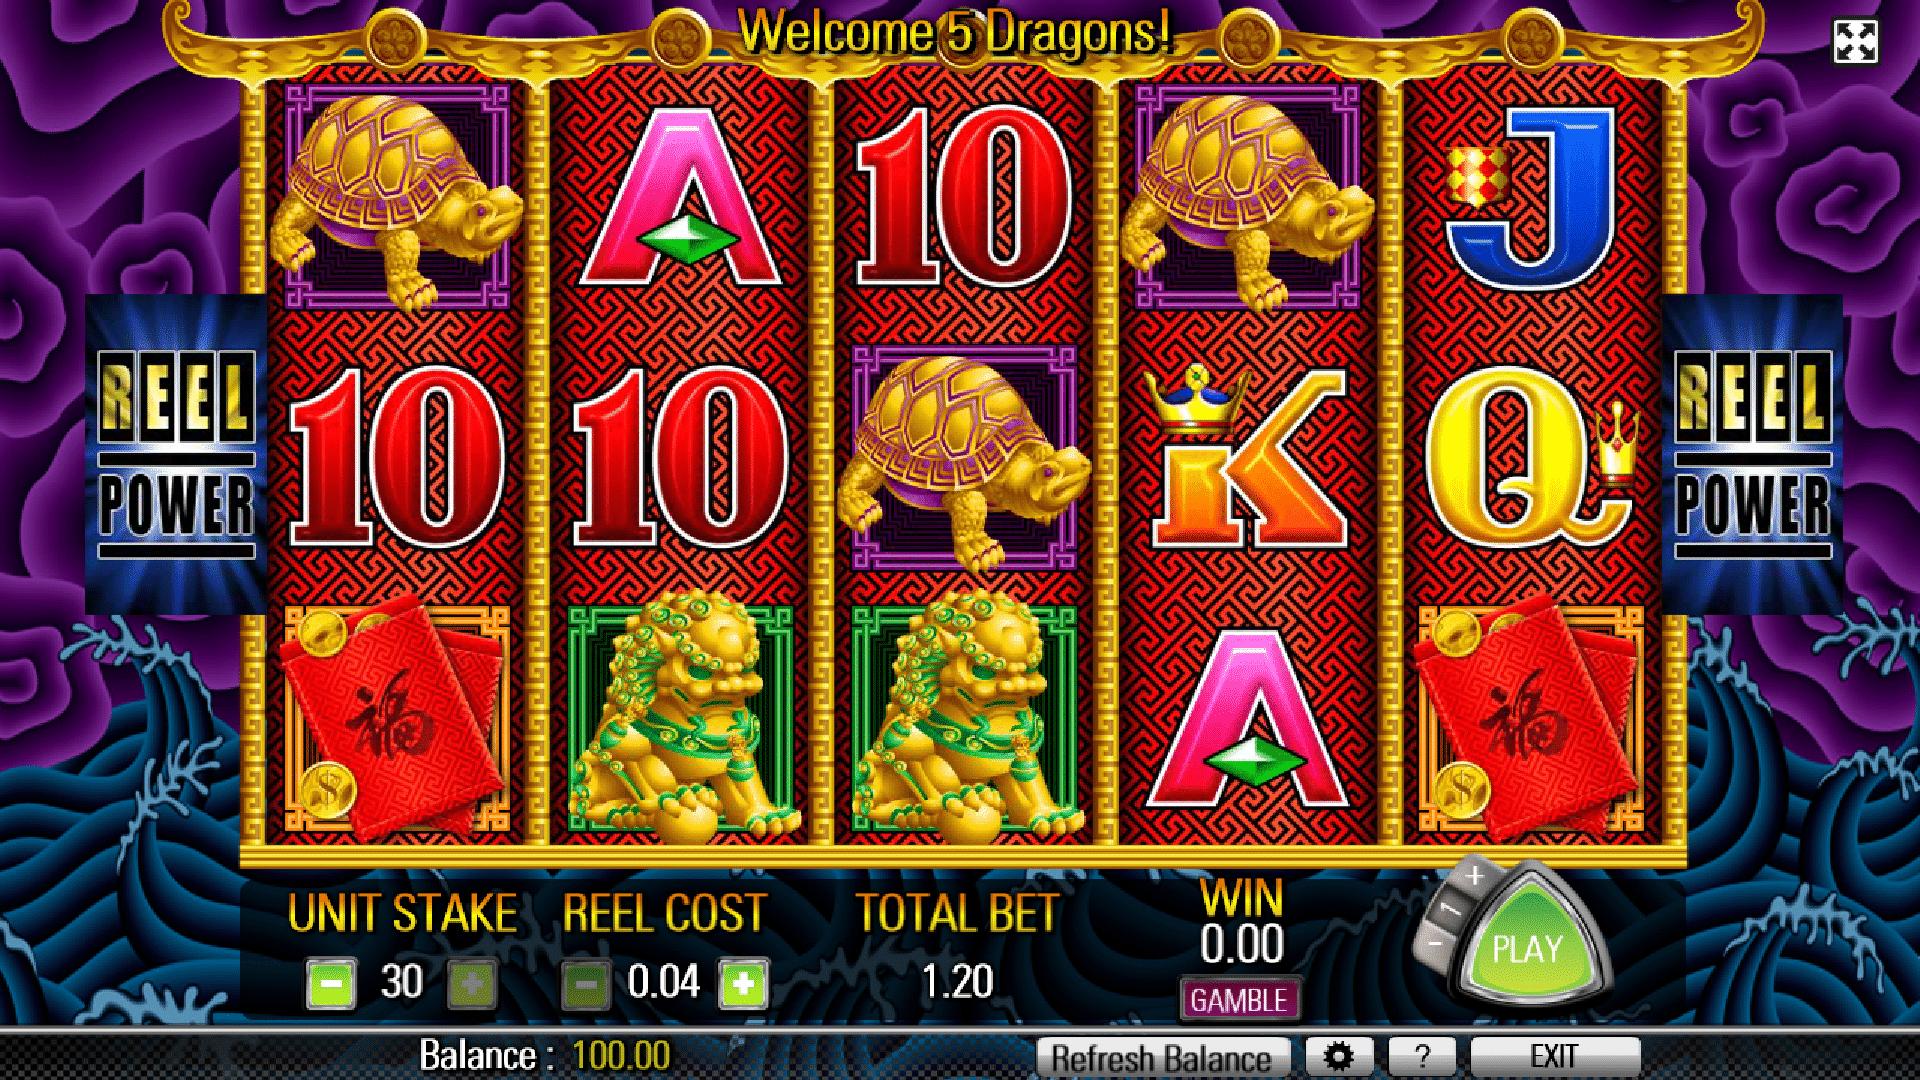 Slot 5 Dragons